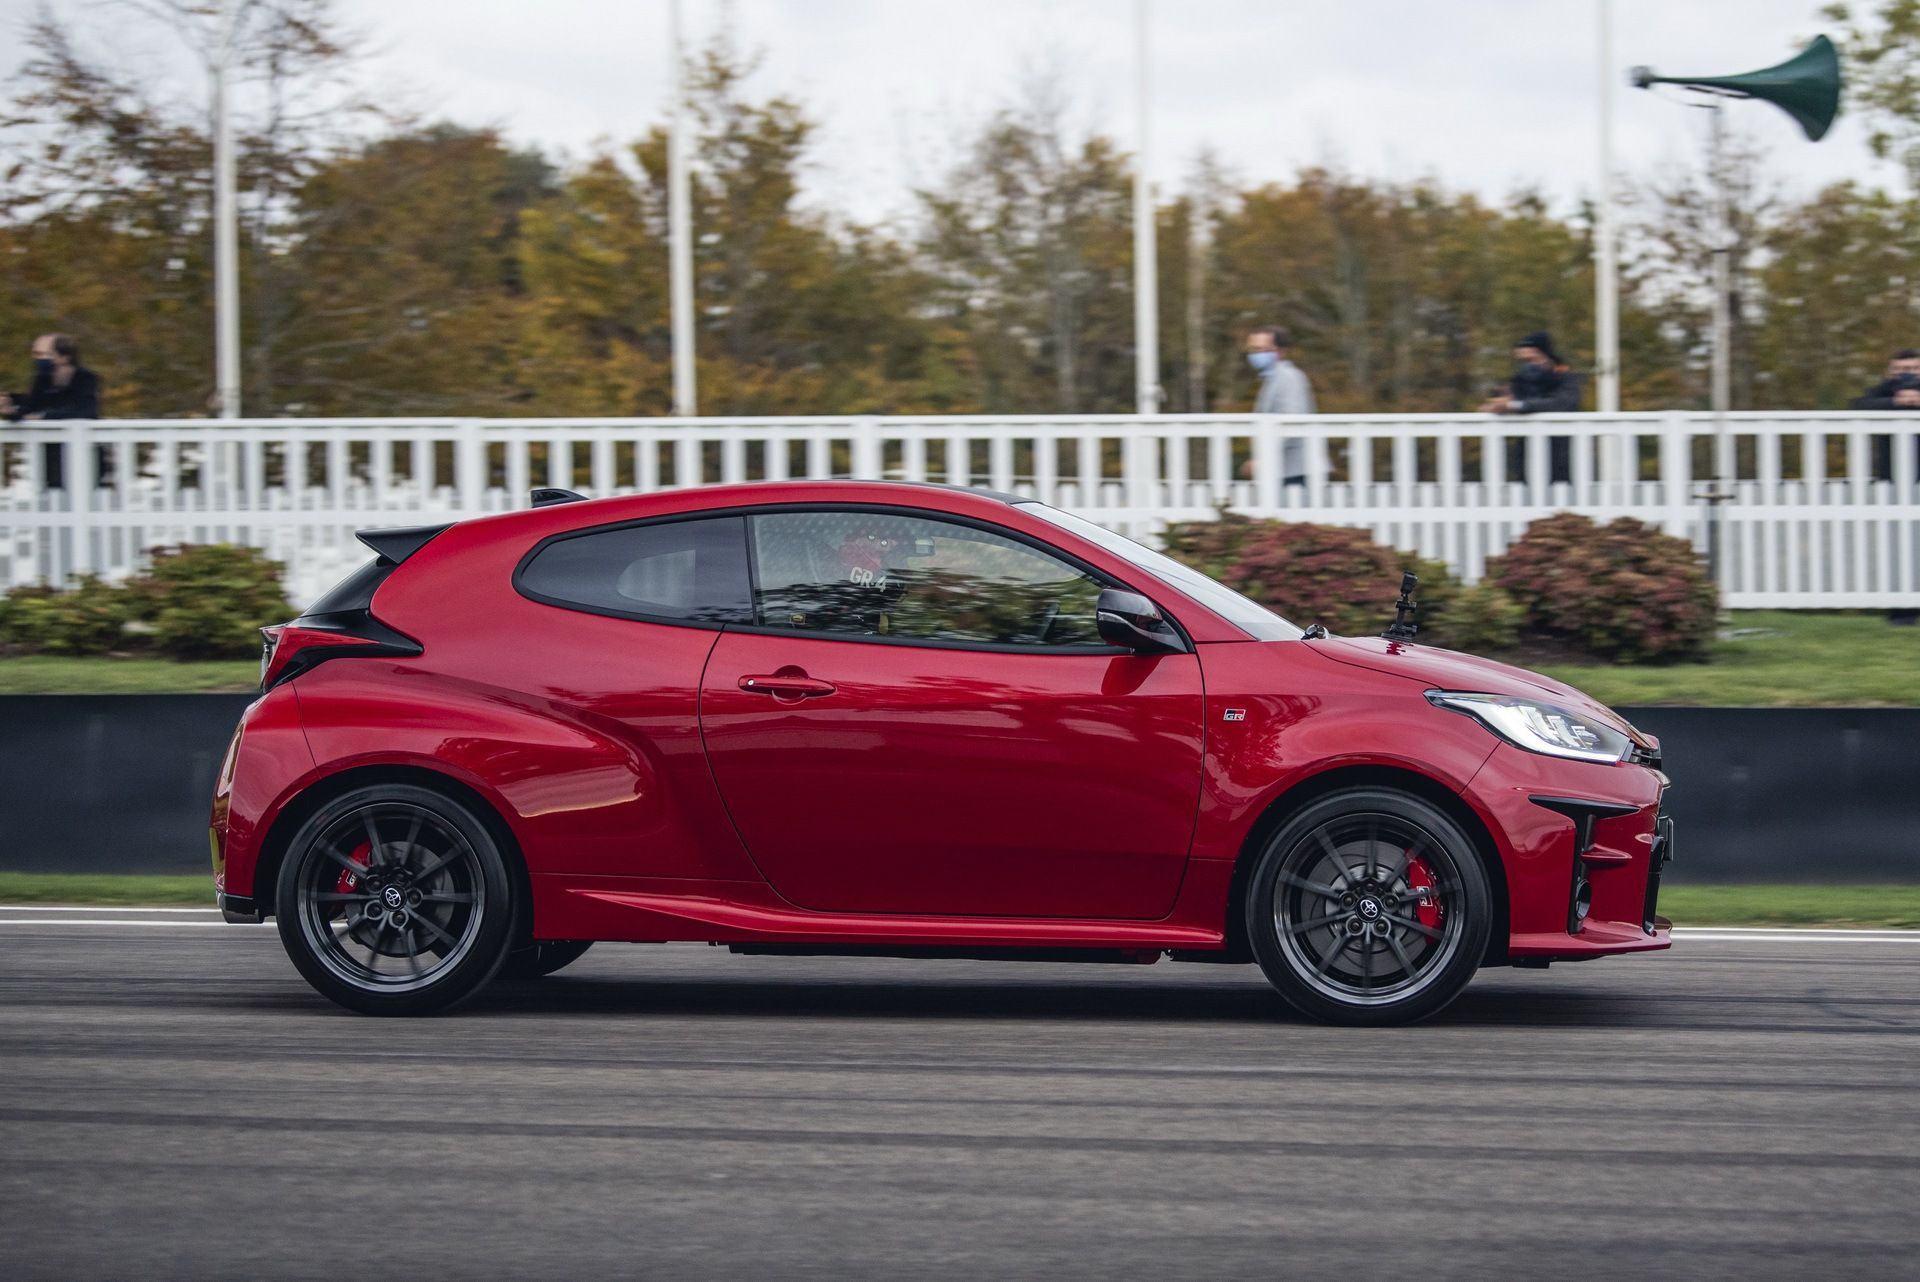 Toyota-GR-Yaris-Goodwood-03